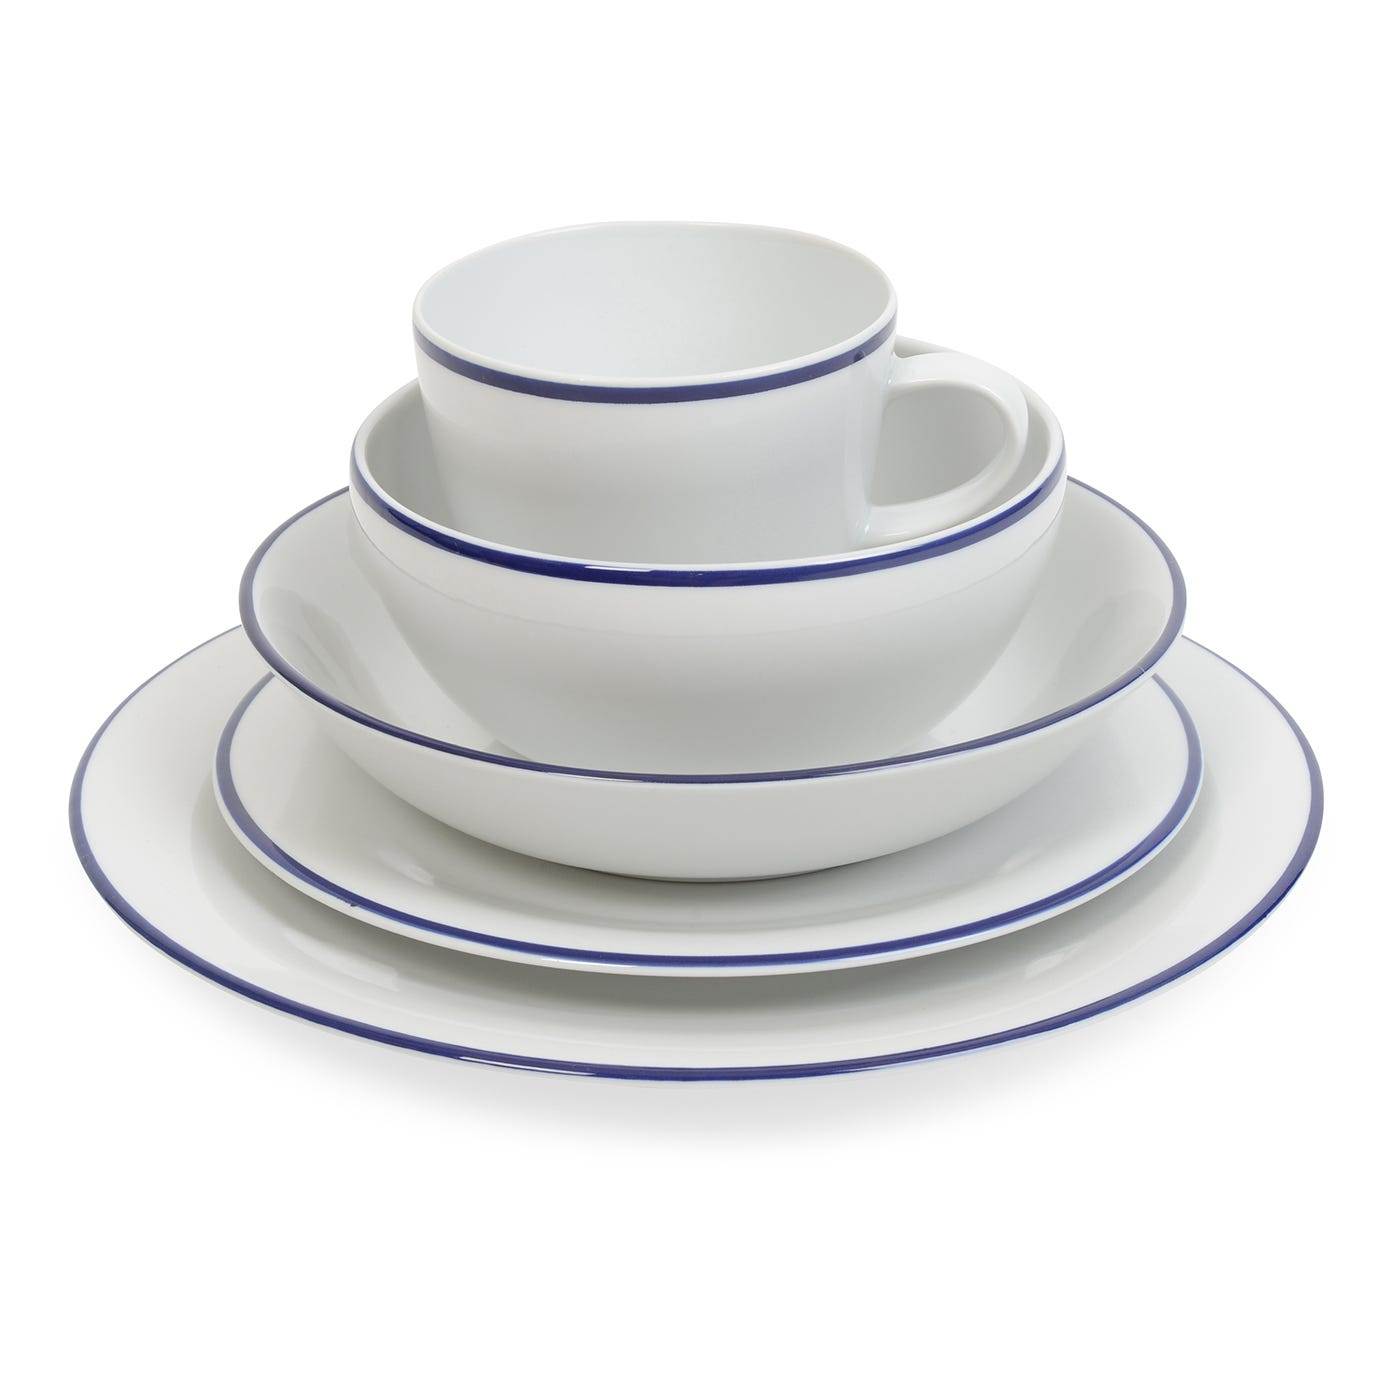 Heal's Seamless Blue Tableware